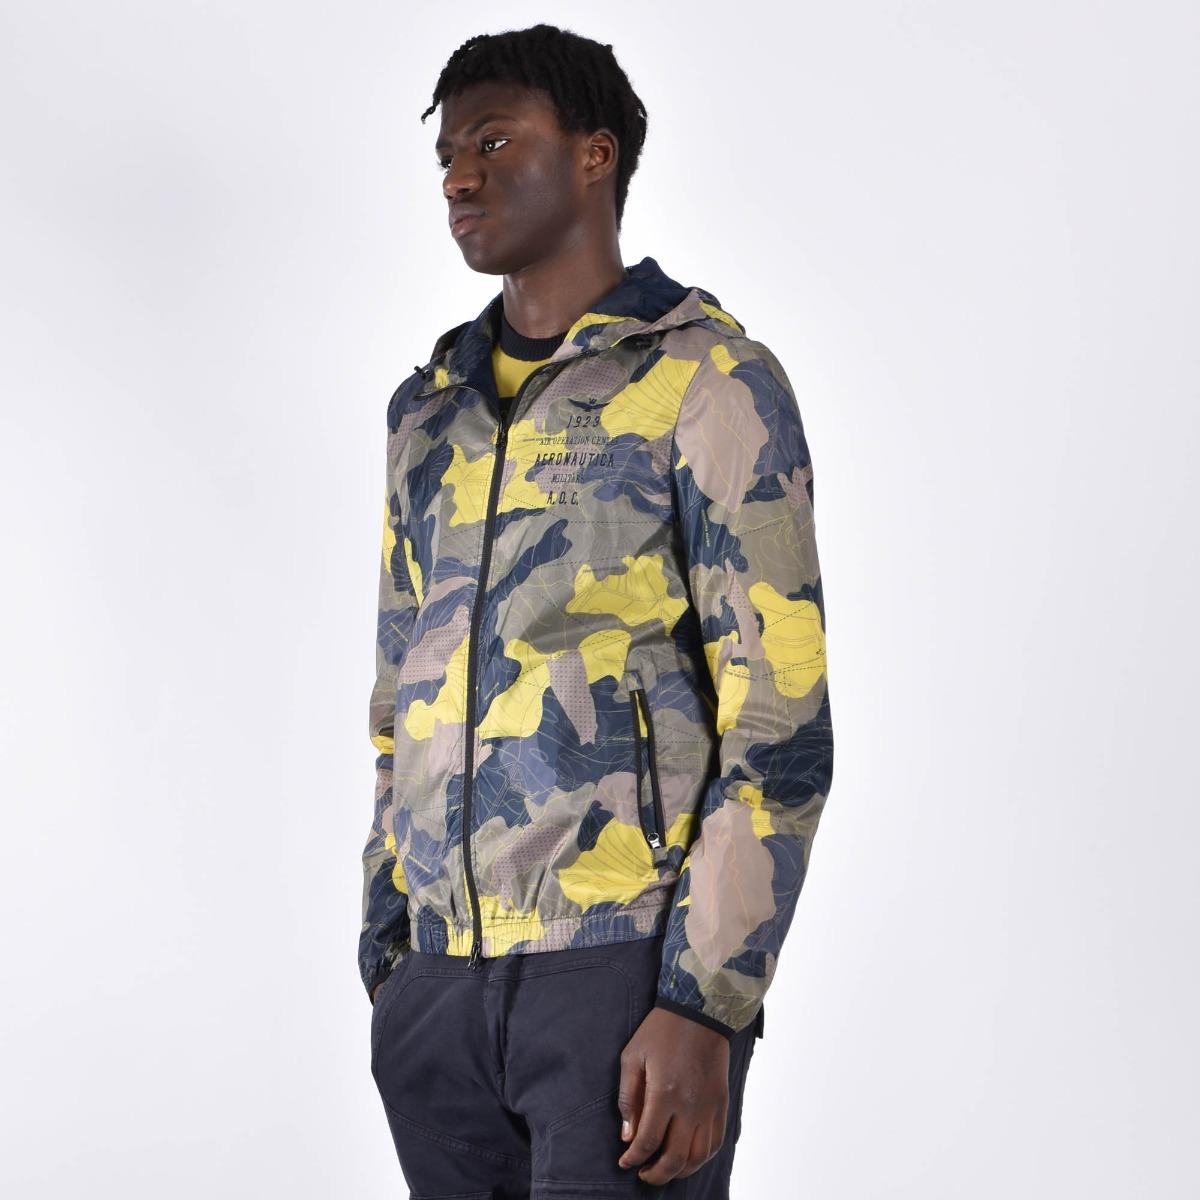 Giubbino k-way camouflage - Verde/giallo